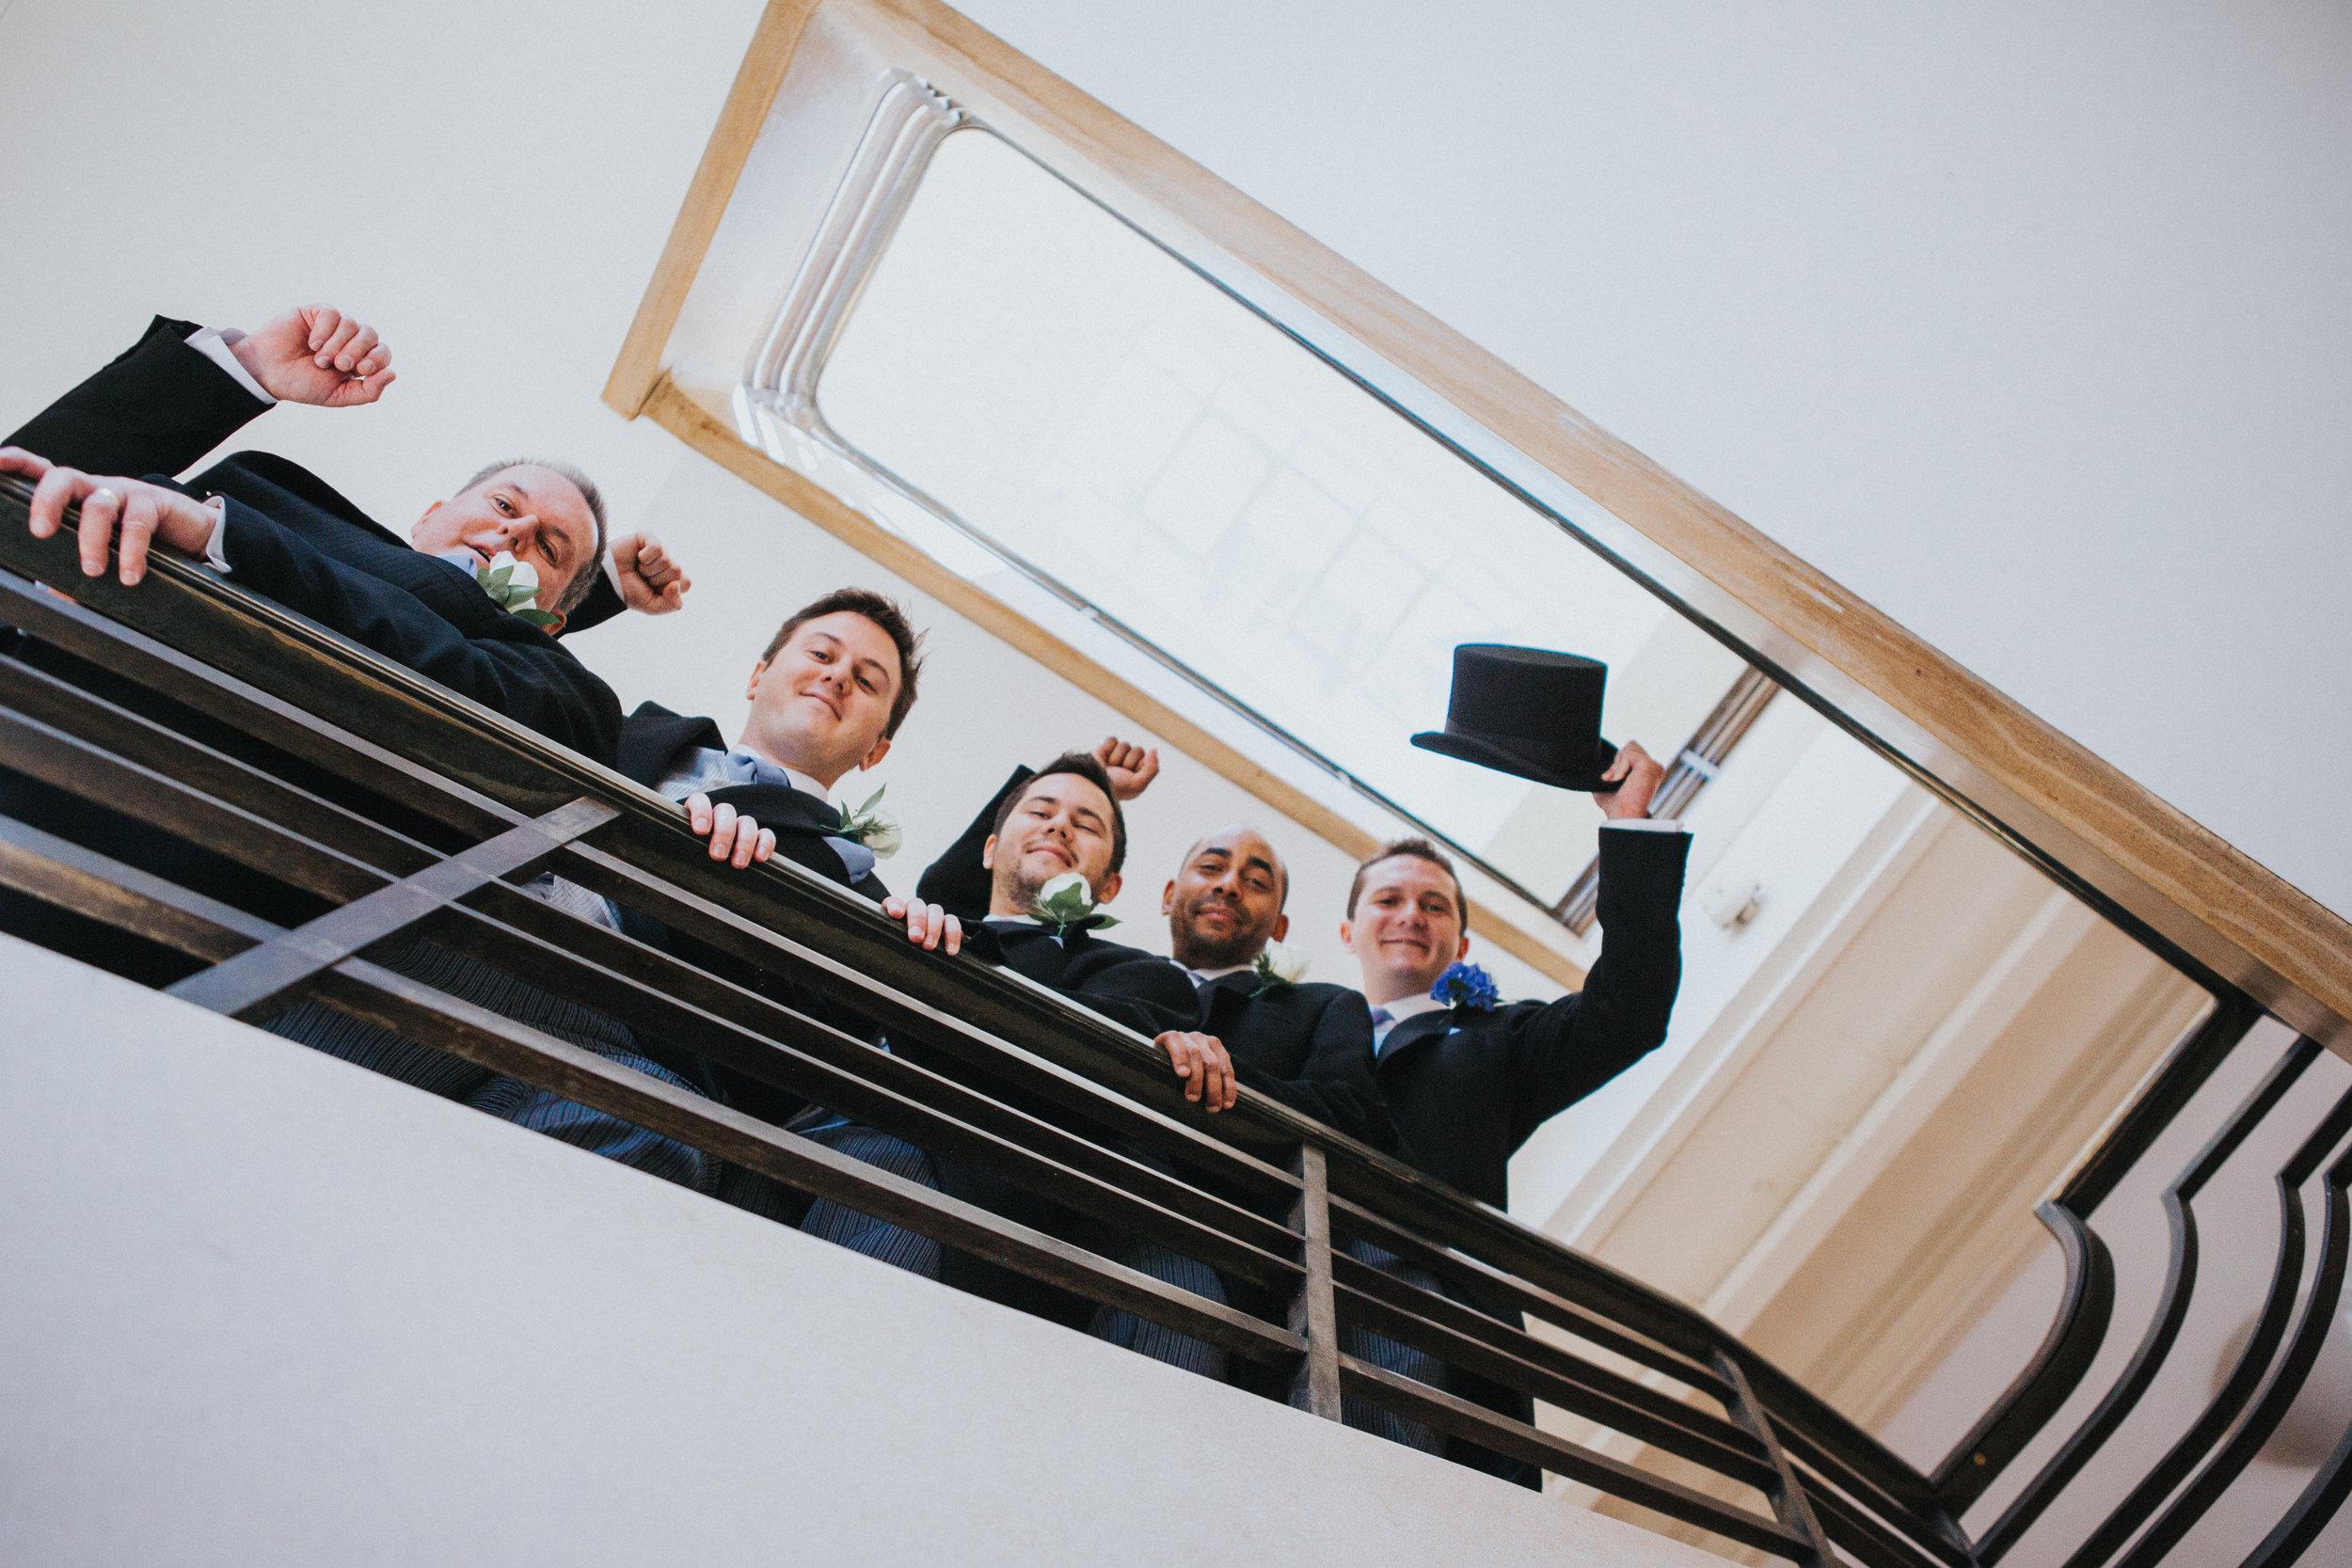 london-wedding-photography-wimbledon-wandsworth-town-hall-registry-groom-prep-21